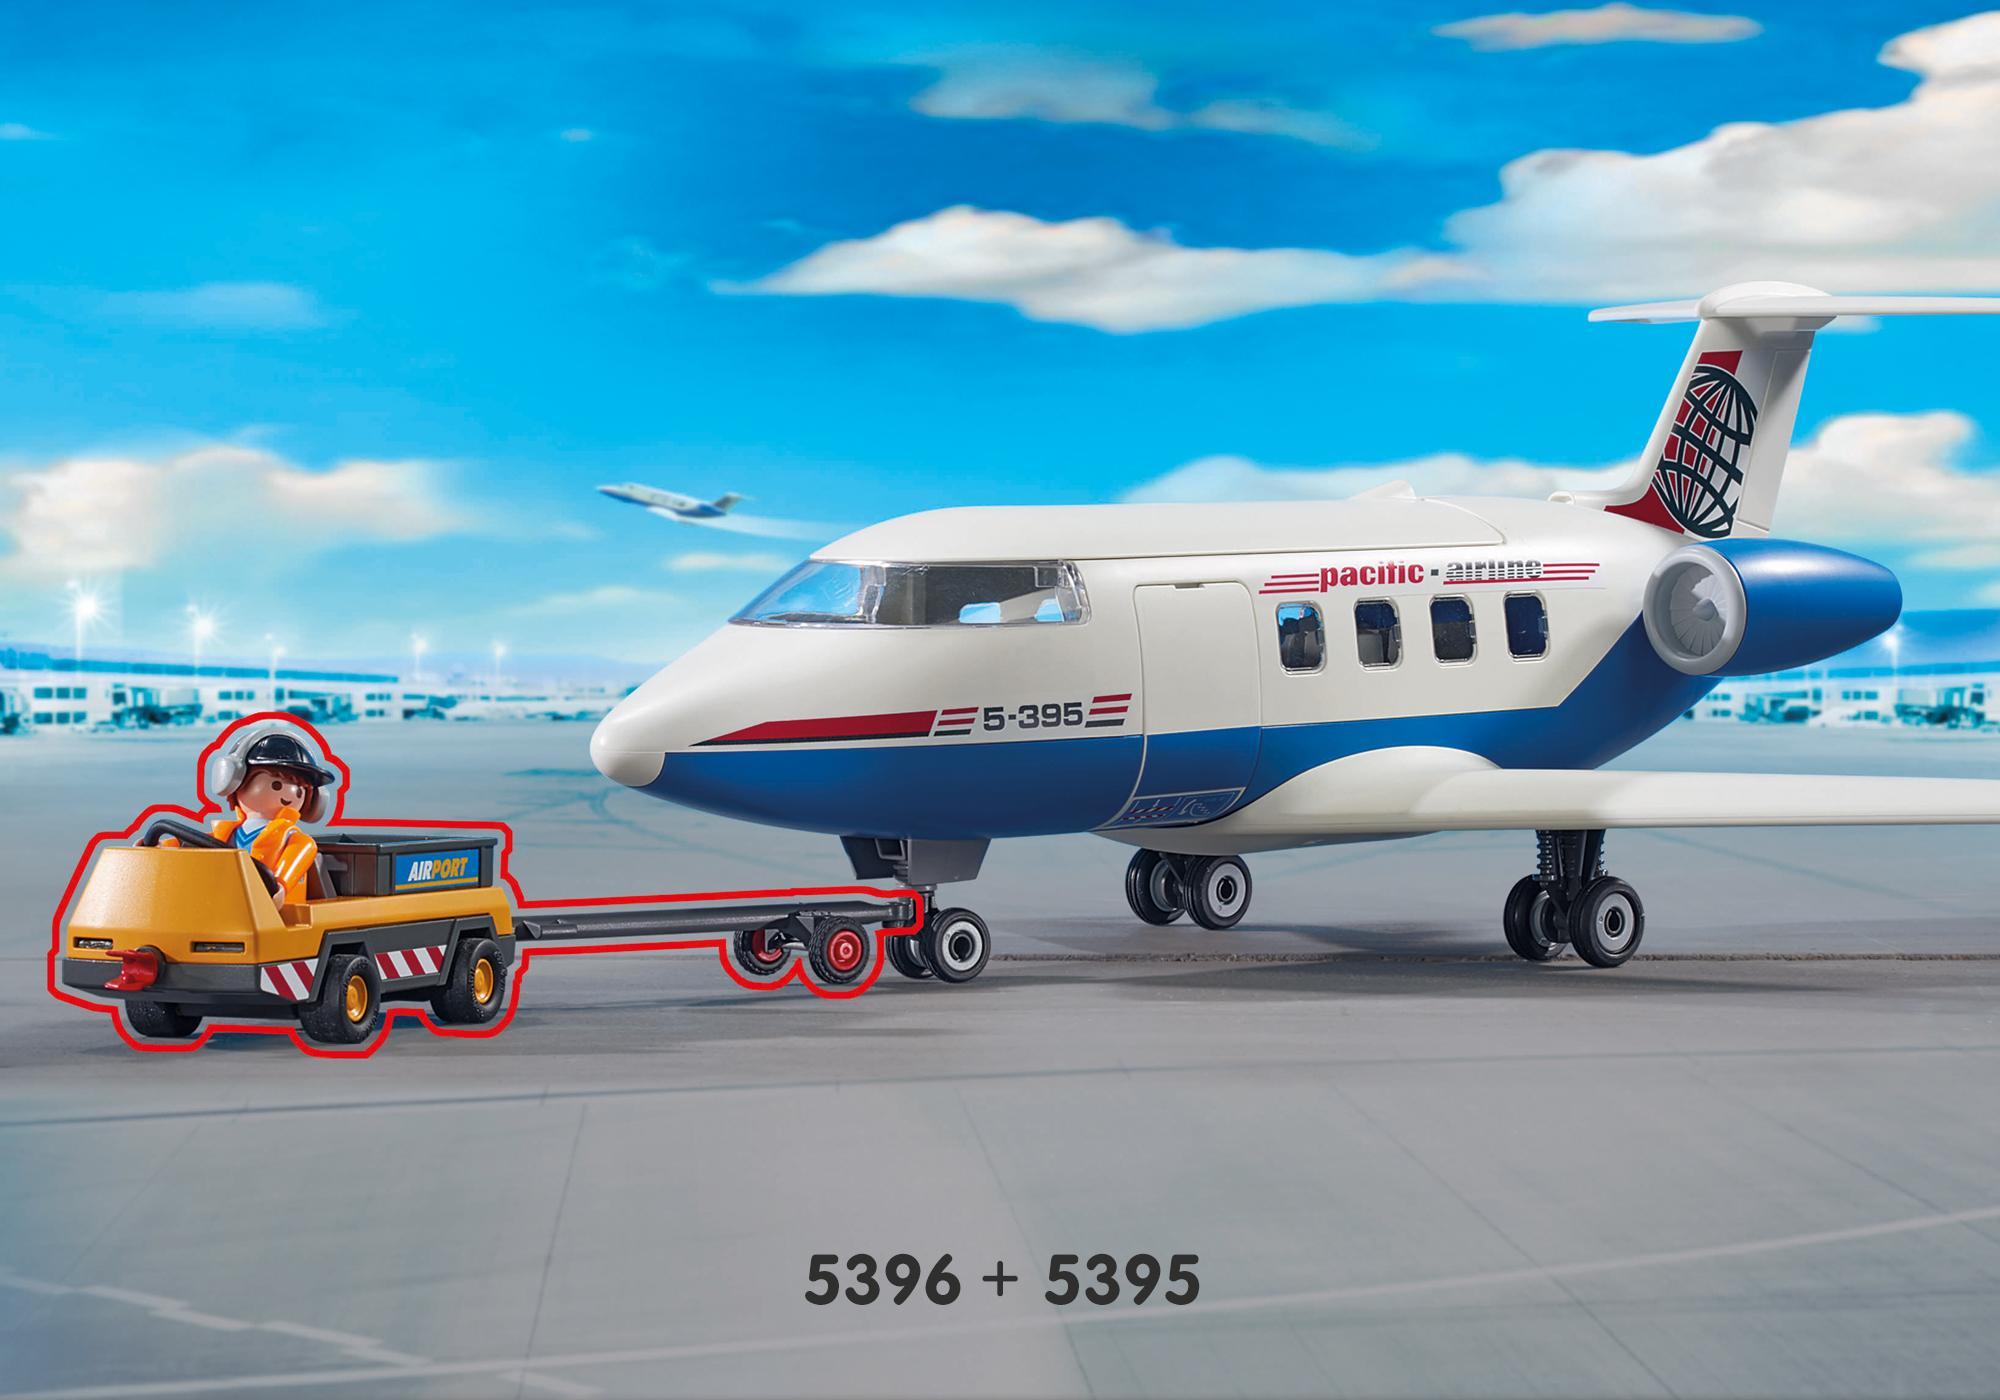 http://media.playmobil.com/i/playmobil/5396_product_extra2/Flugzeugschlepper mit Fluglotsen